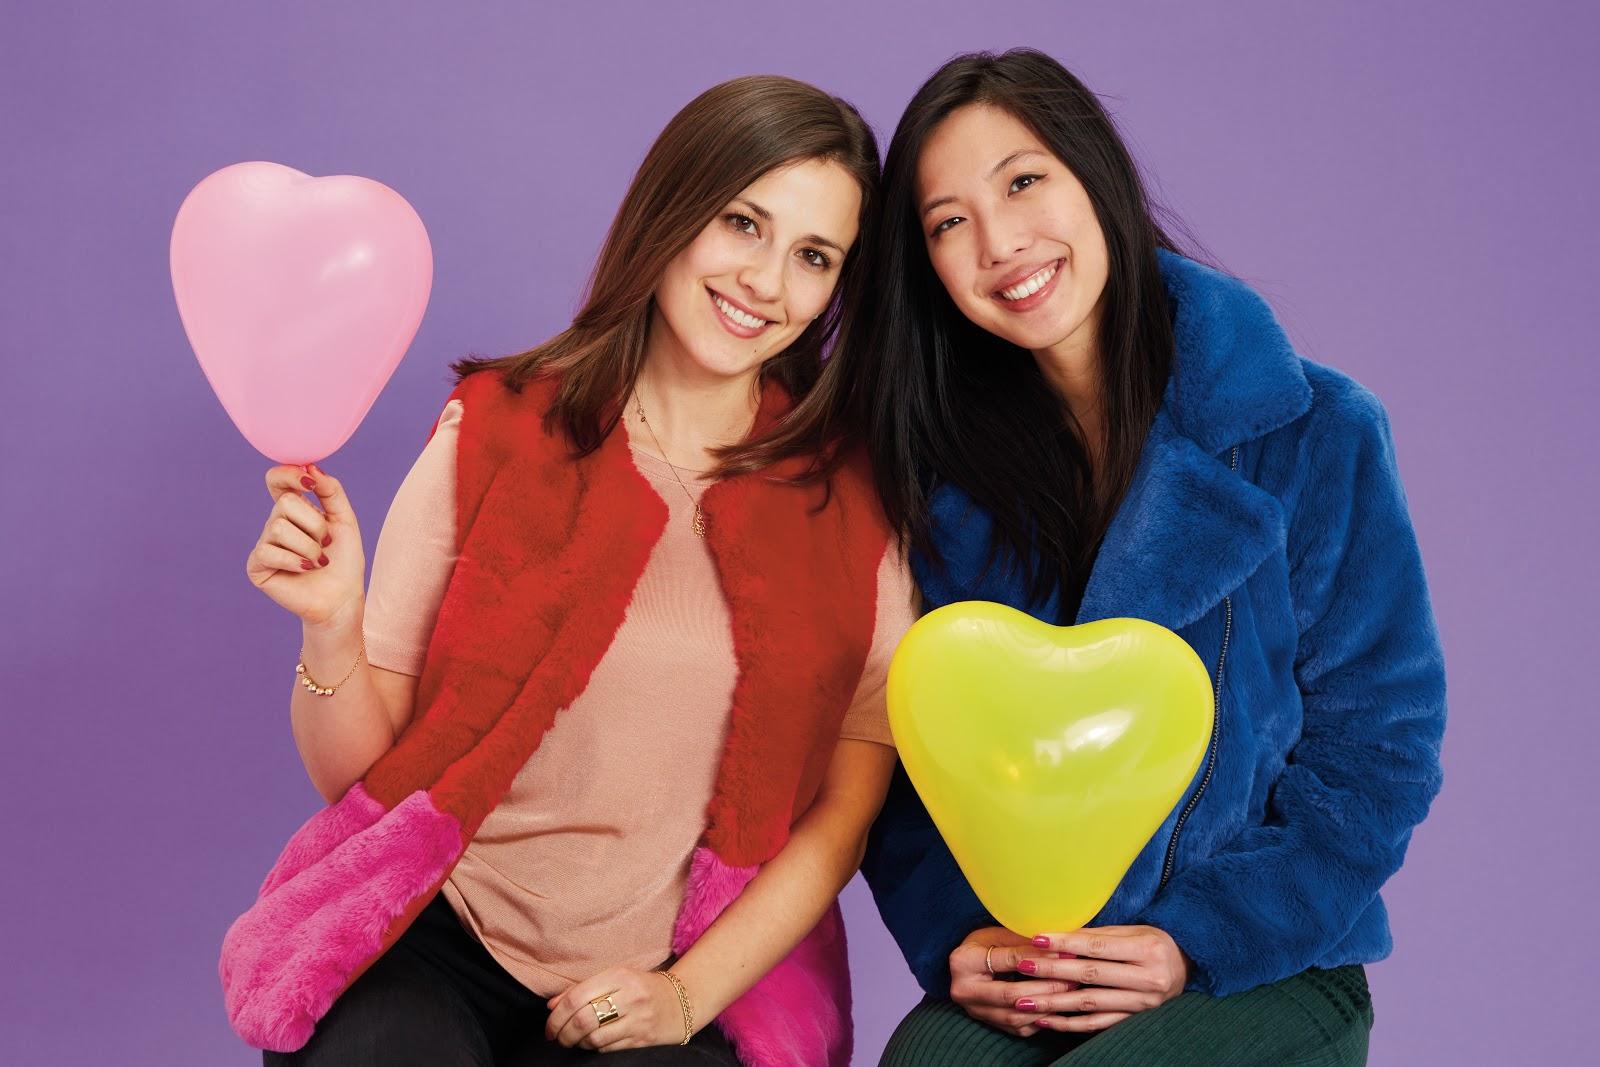 Pepper founders Lia Winograd and Jaclyn Fu